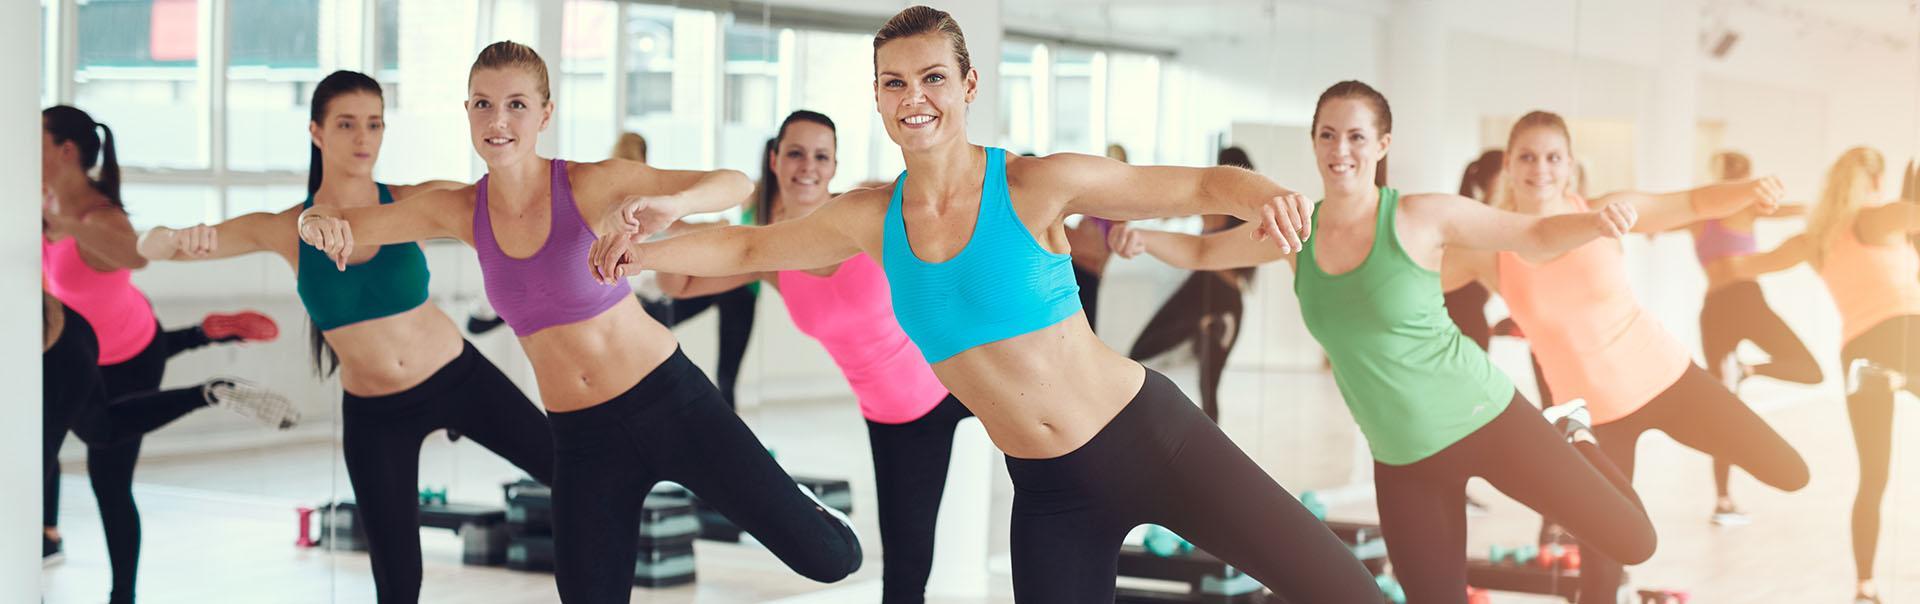 Online Aerobics Classes | Aerobic Workouts